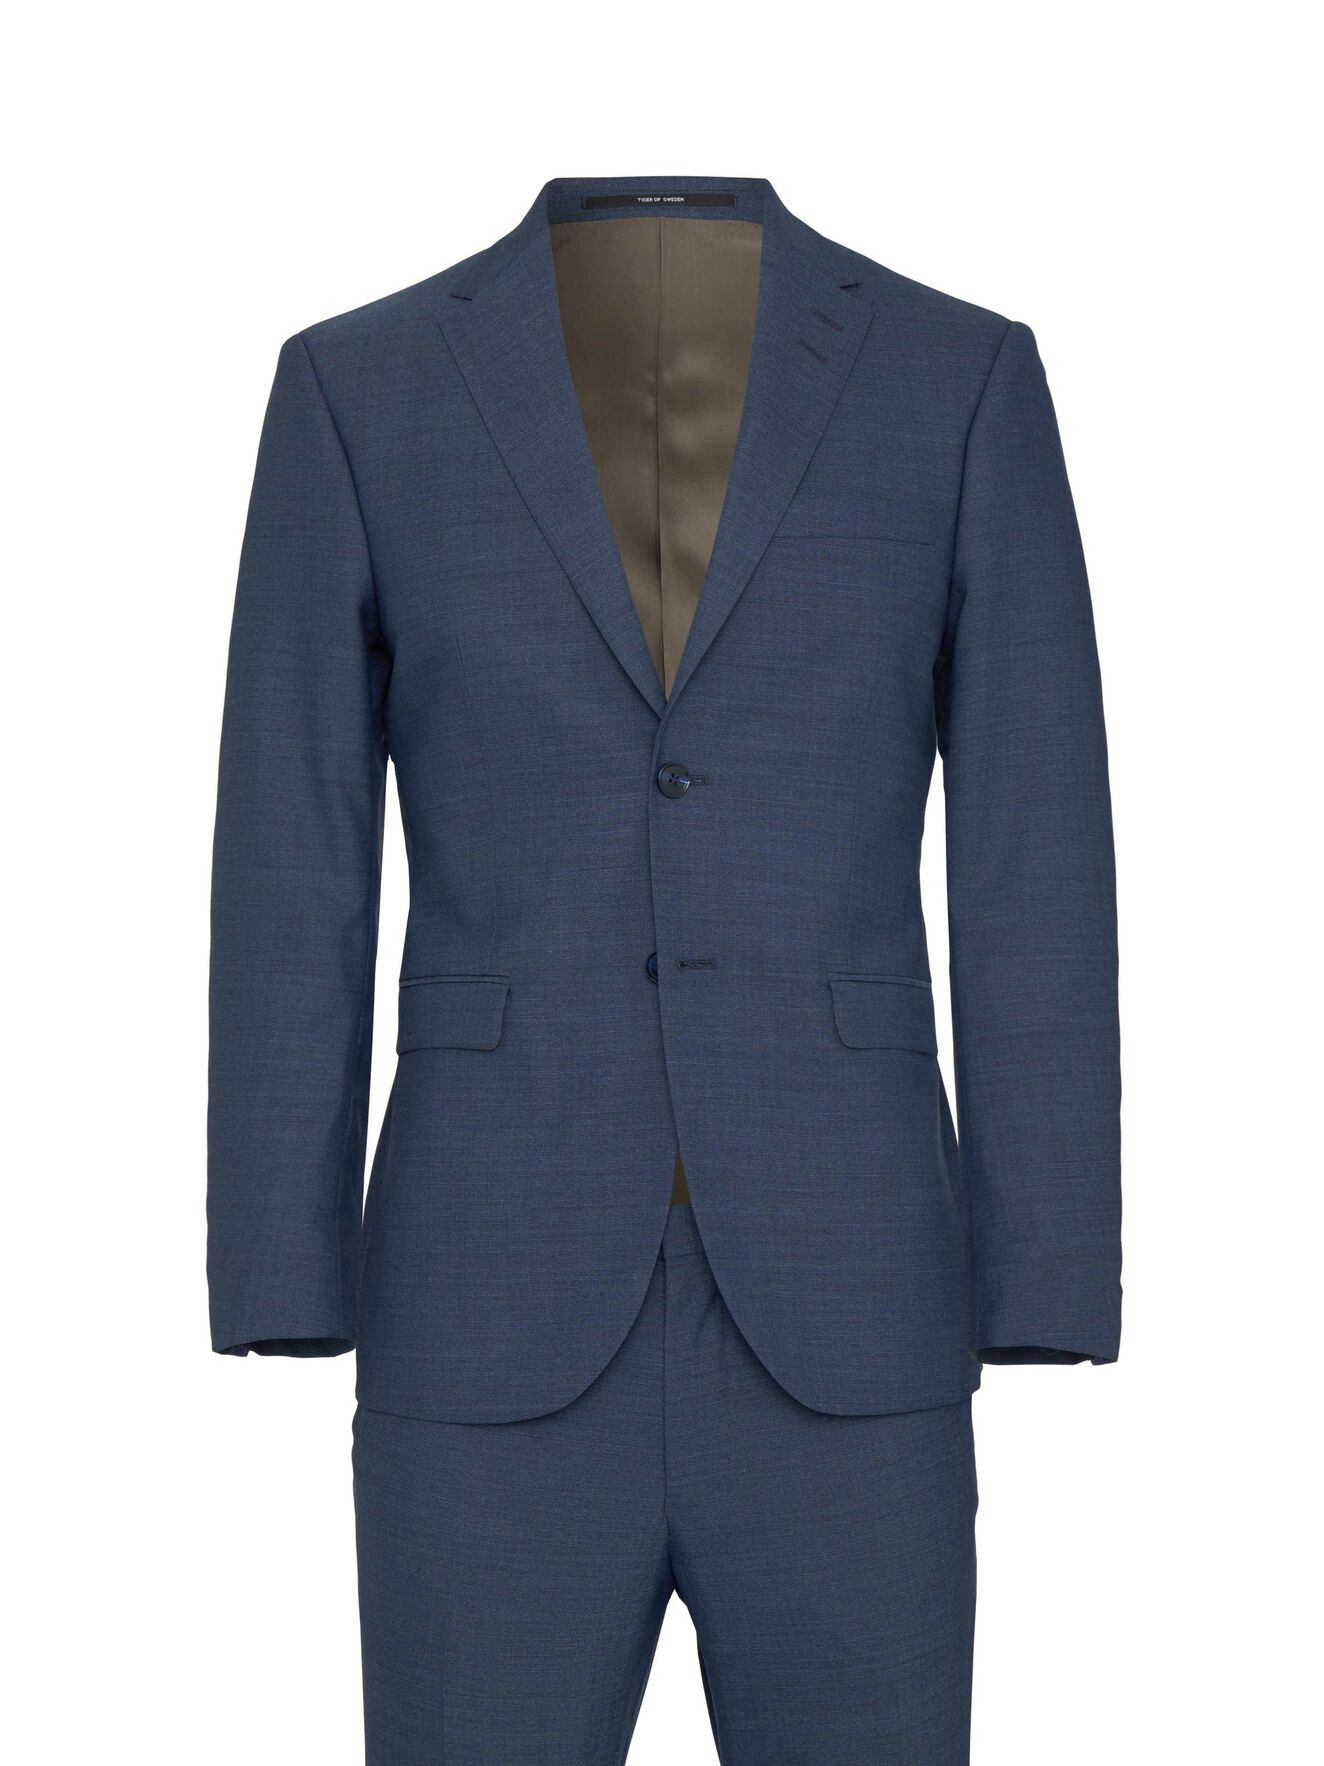 Henrie Suit in Port Blue from Tiger of Sweden